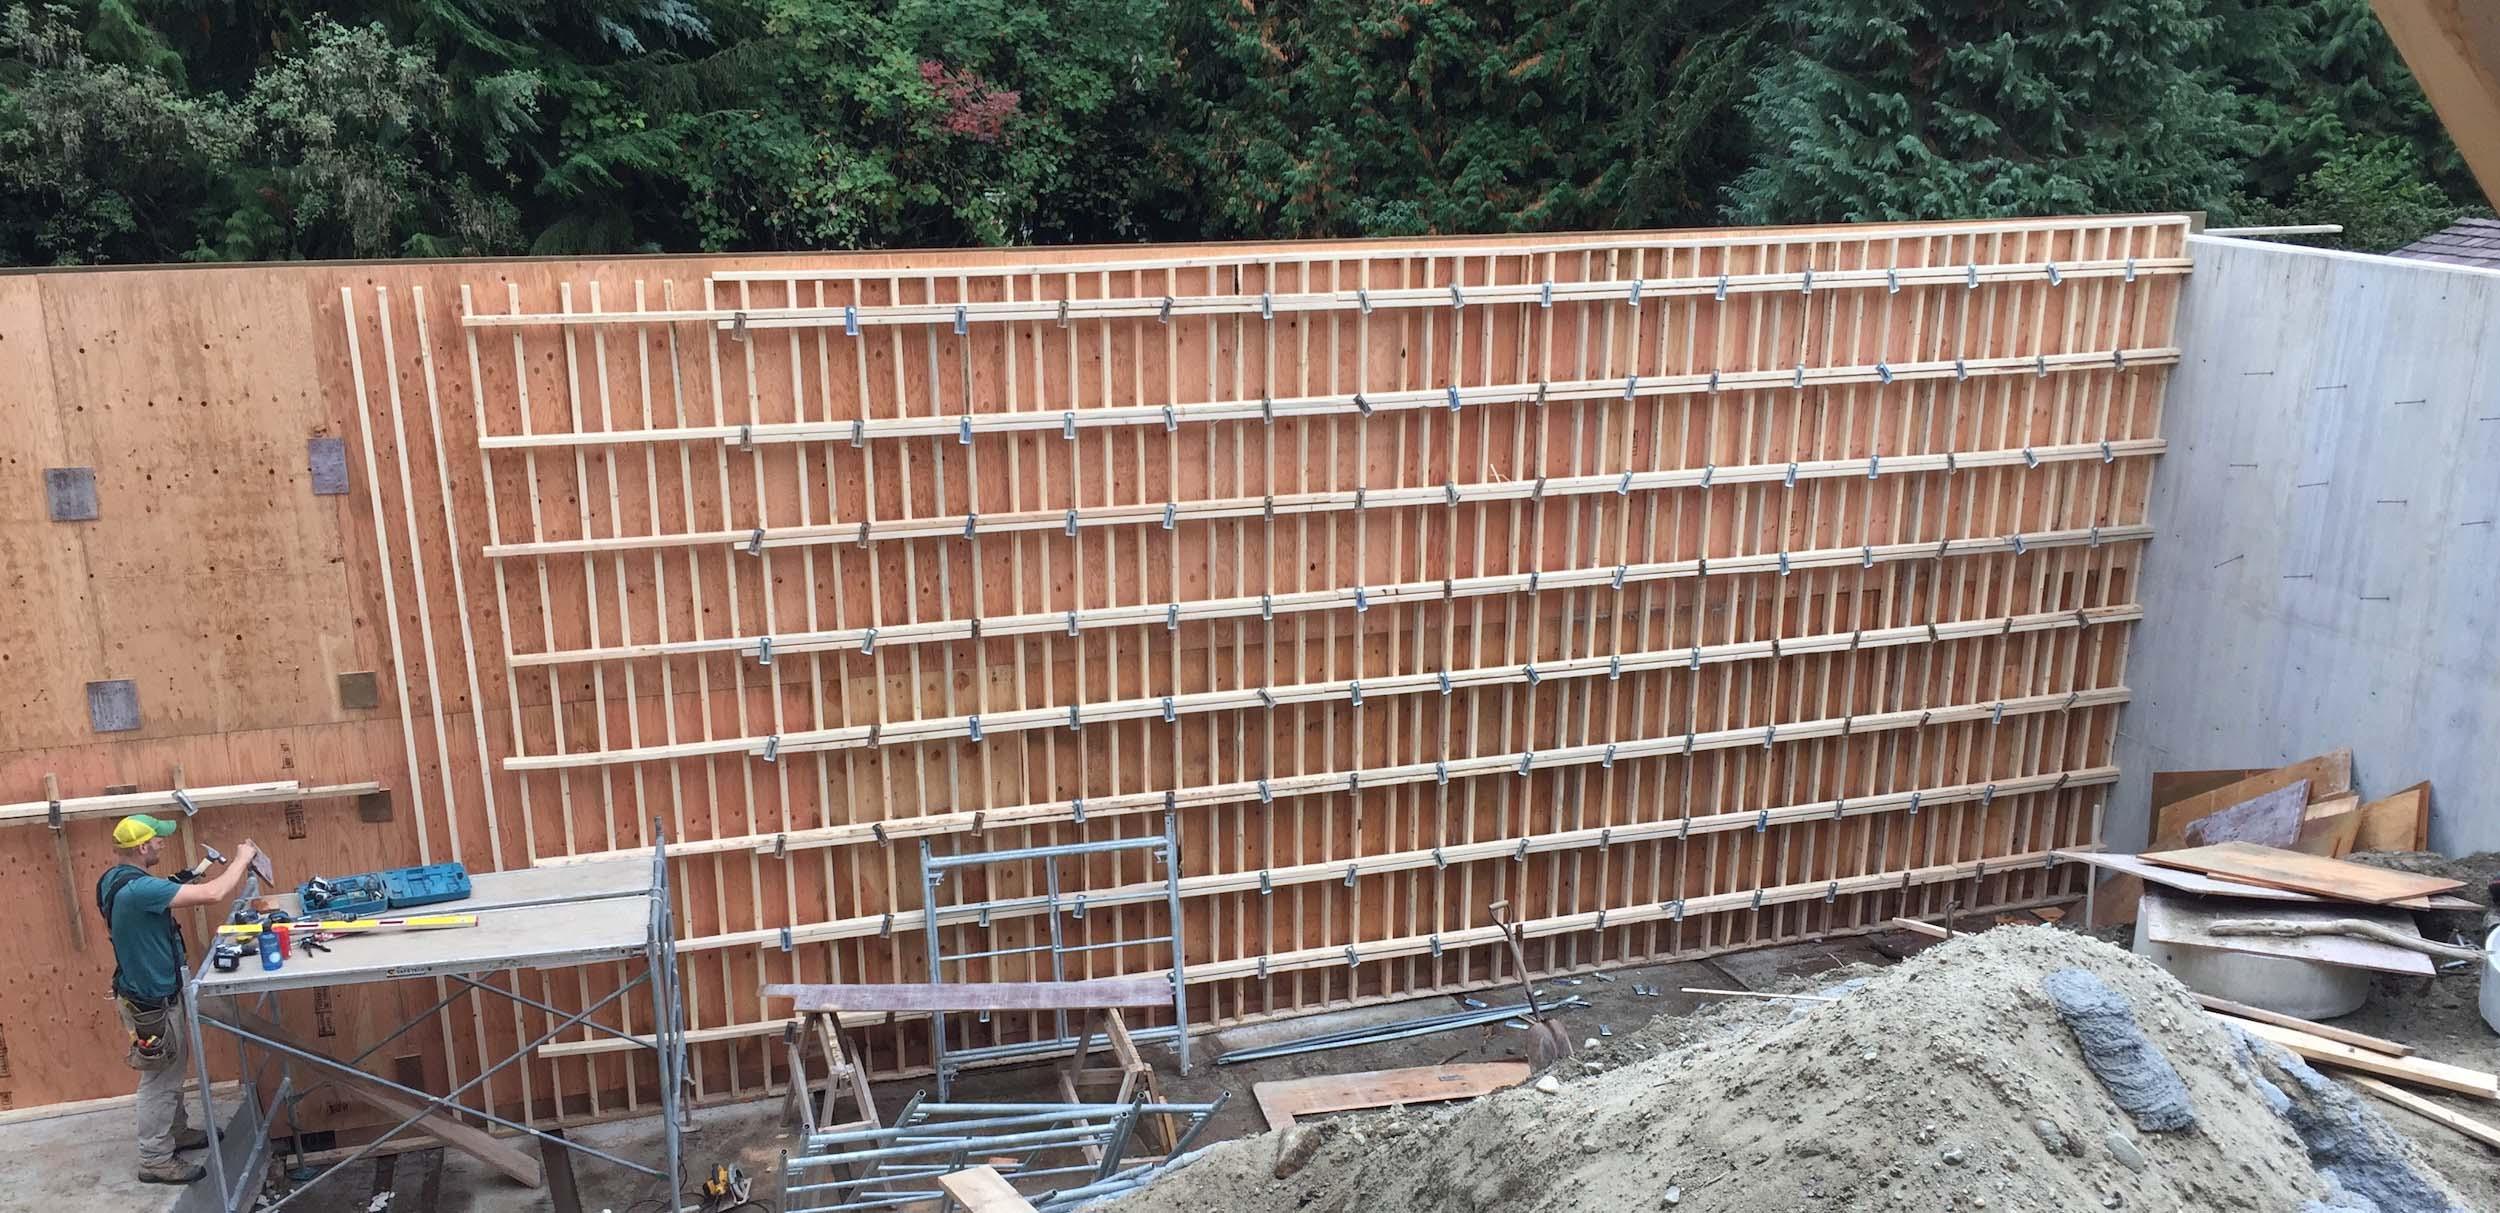 Postle_Construction_ConcreteForming11.jpg